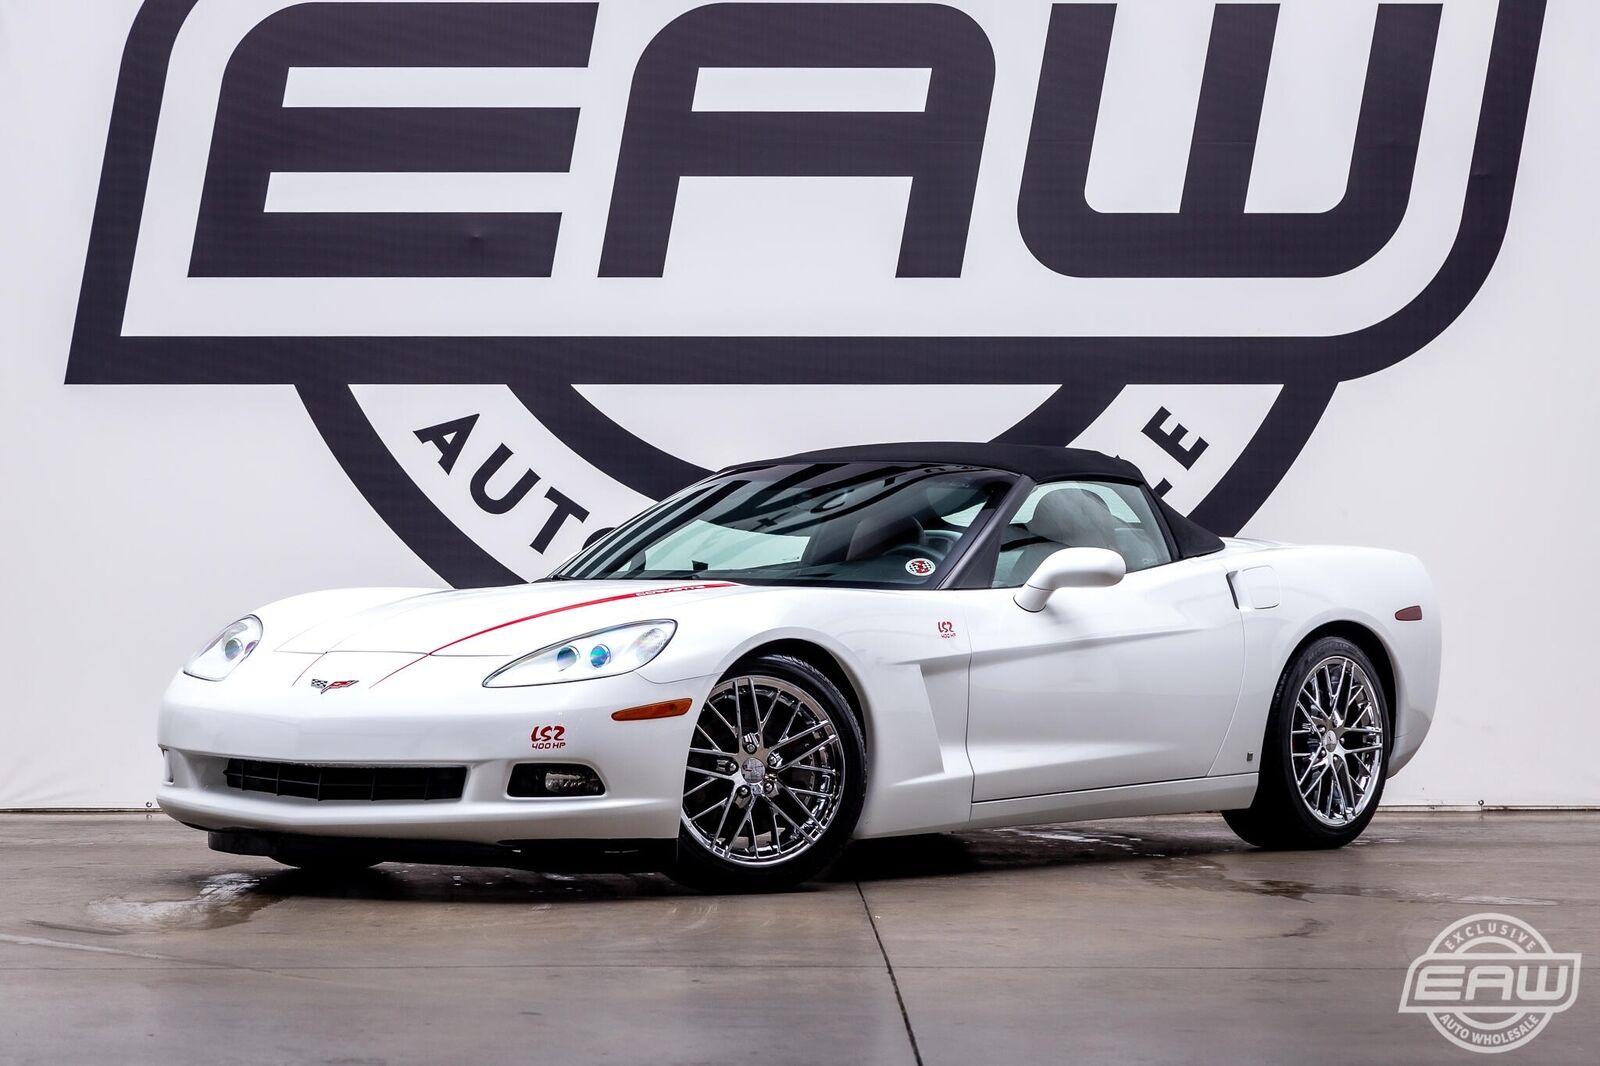 2006 White Chevrolet Corvette Convertible  | C6 Corvette Photo 2